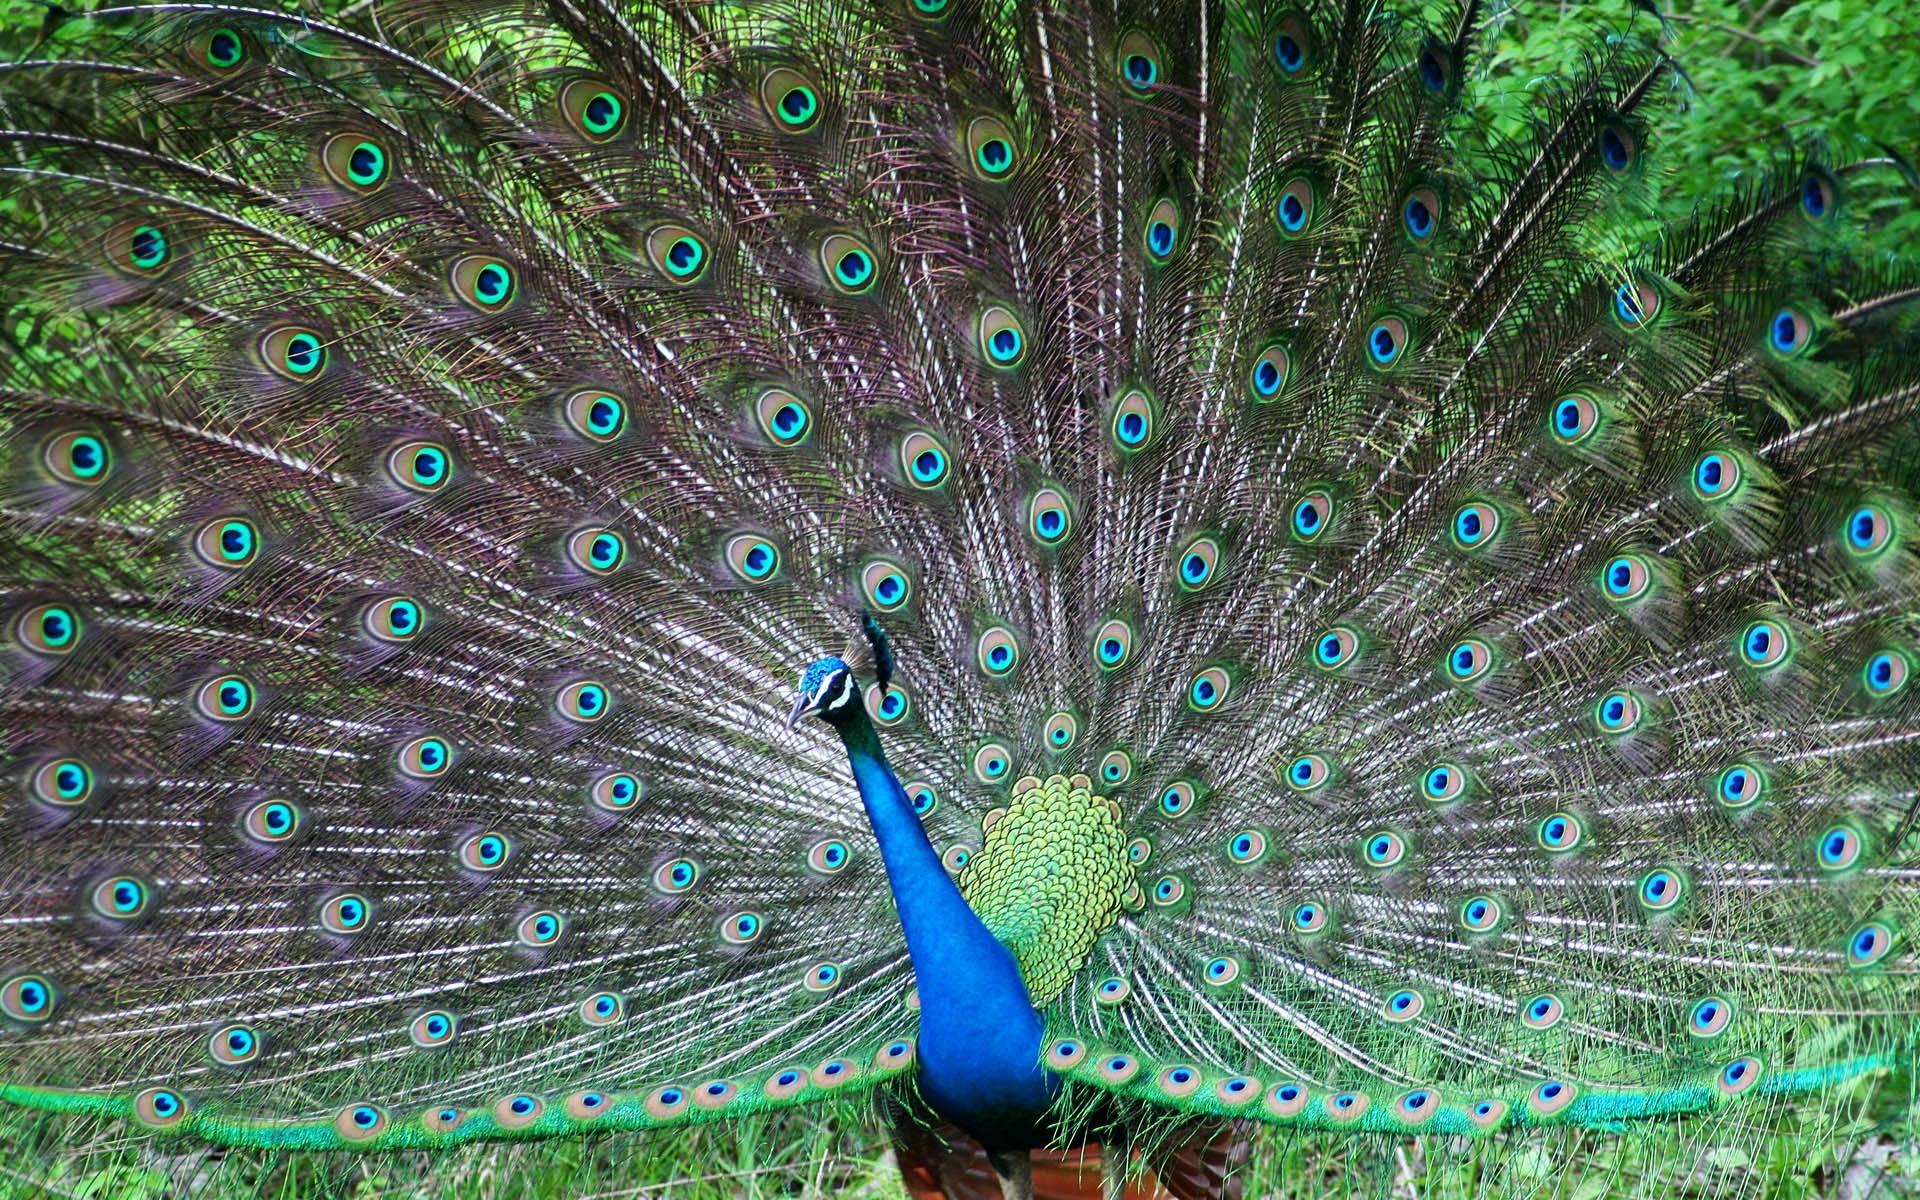 Peacock Feather Desktop Wallpaper Wallpapers Of Peacock ...